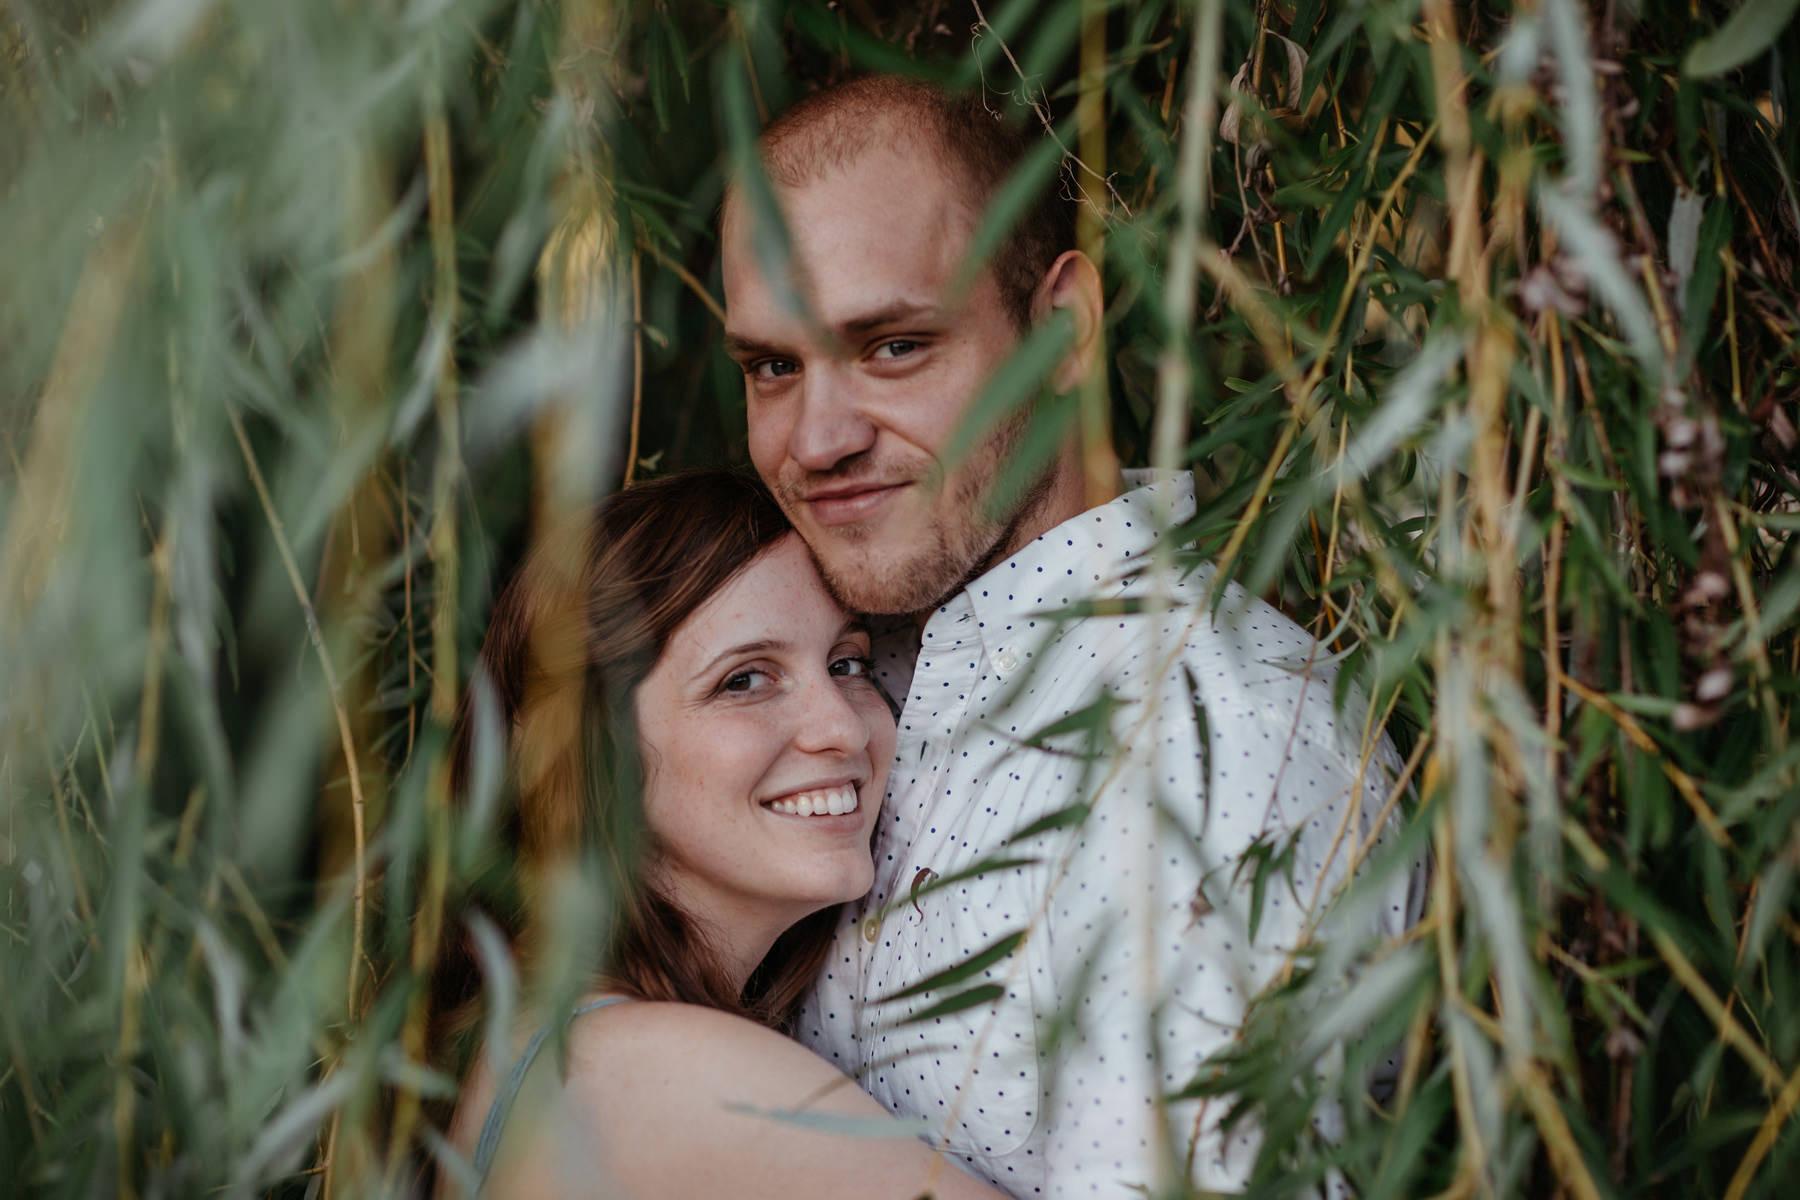 Kansas City_Penn Valley Park_Engagement Session_Kindling Wedding Photography16.JPG